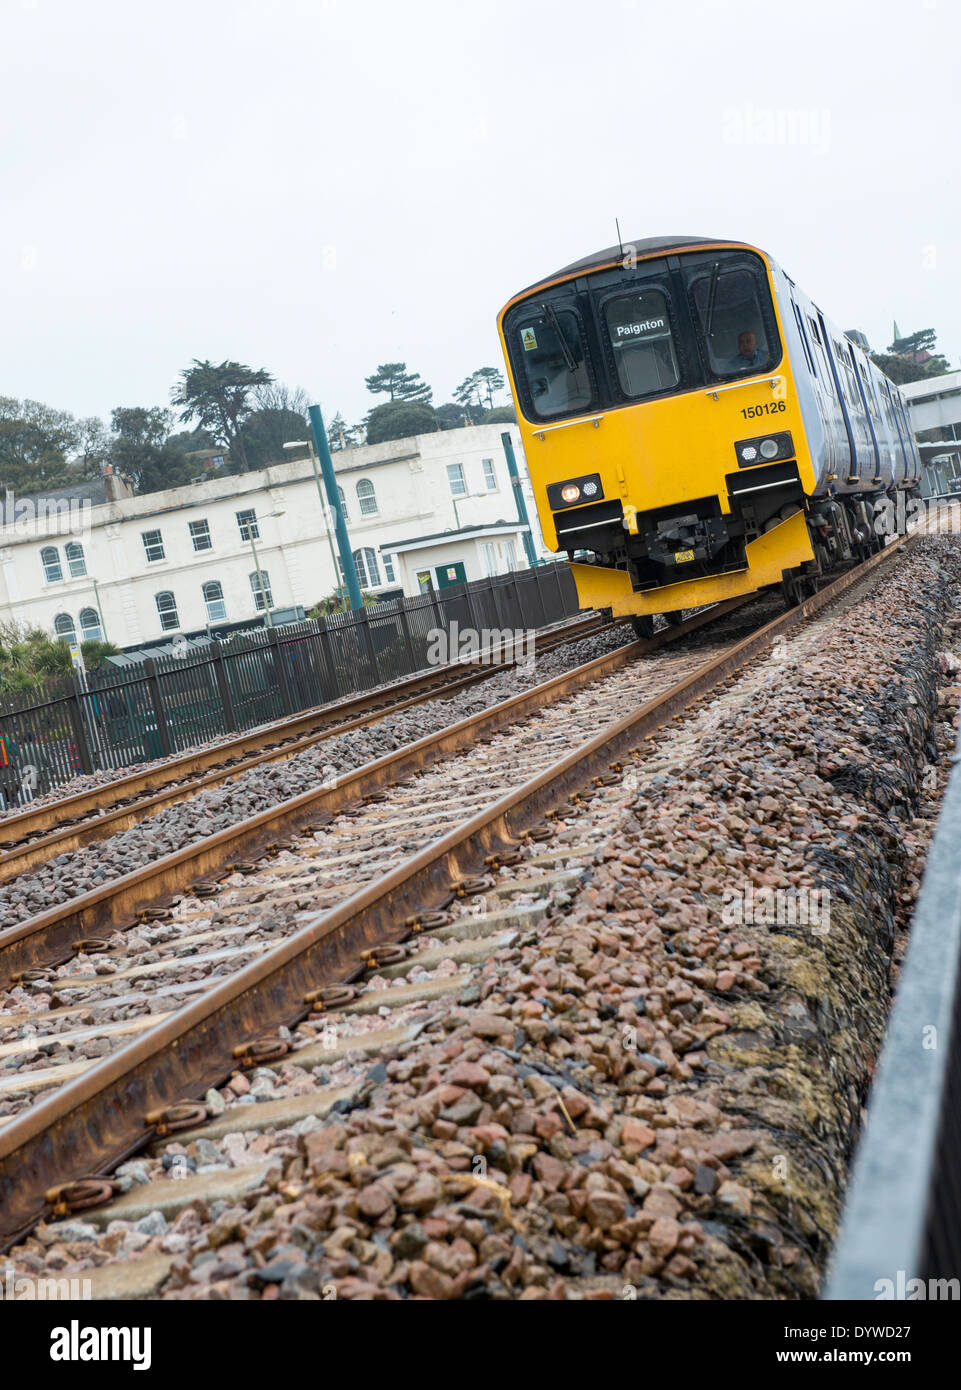 Newly re-opened railway track after the 2014 storm damage in Dawlish, Devon UK - Stock Image